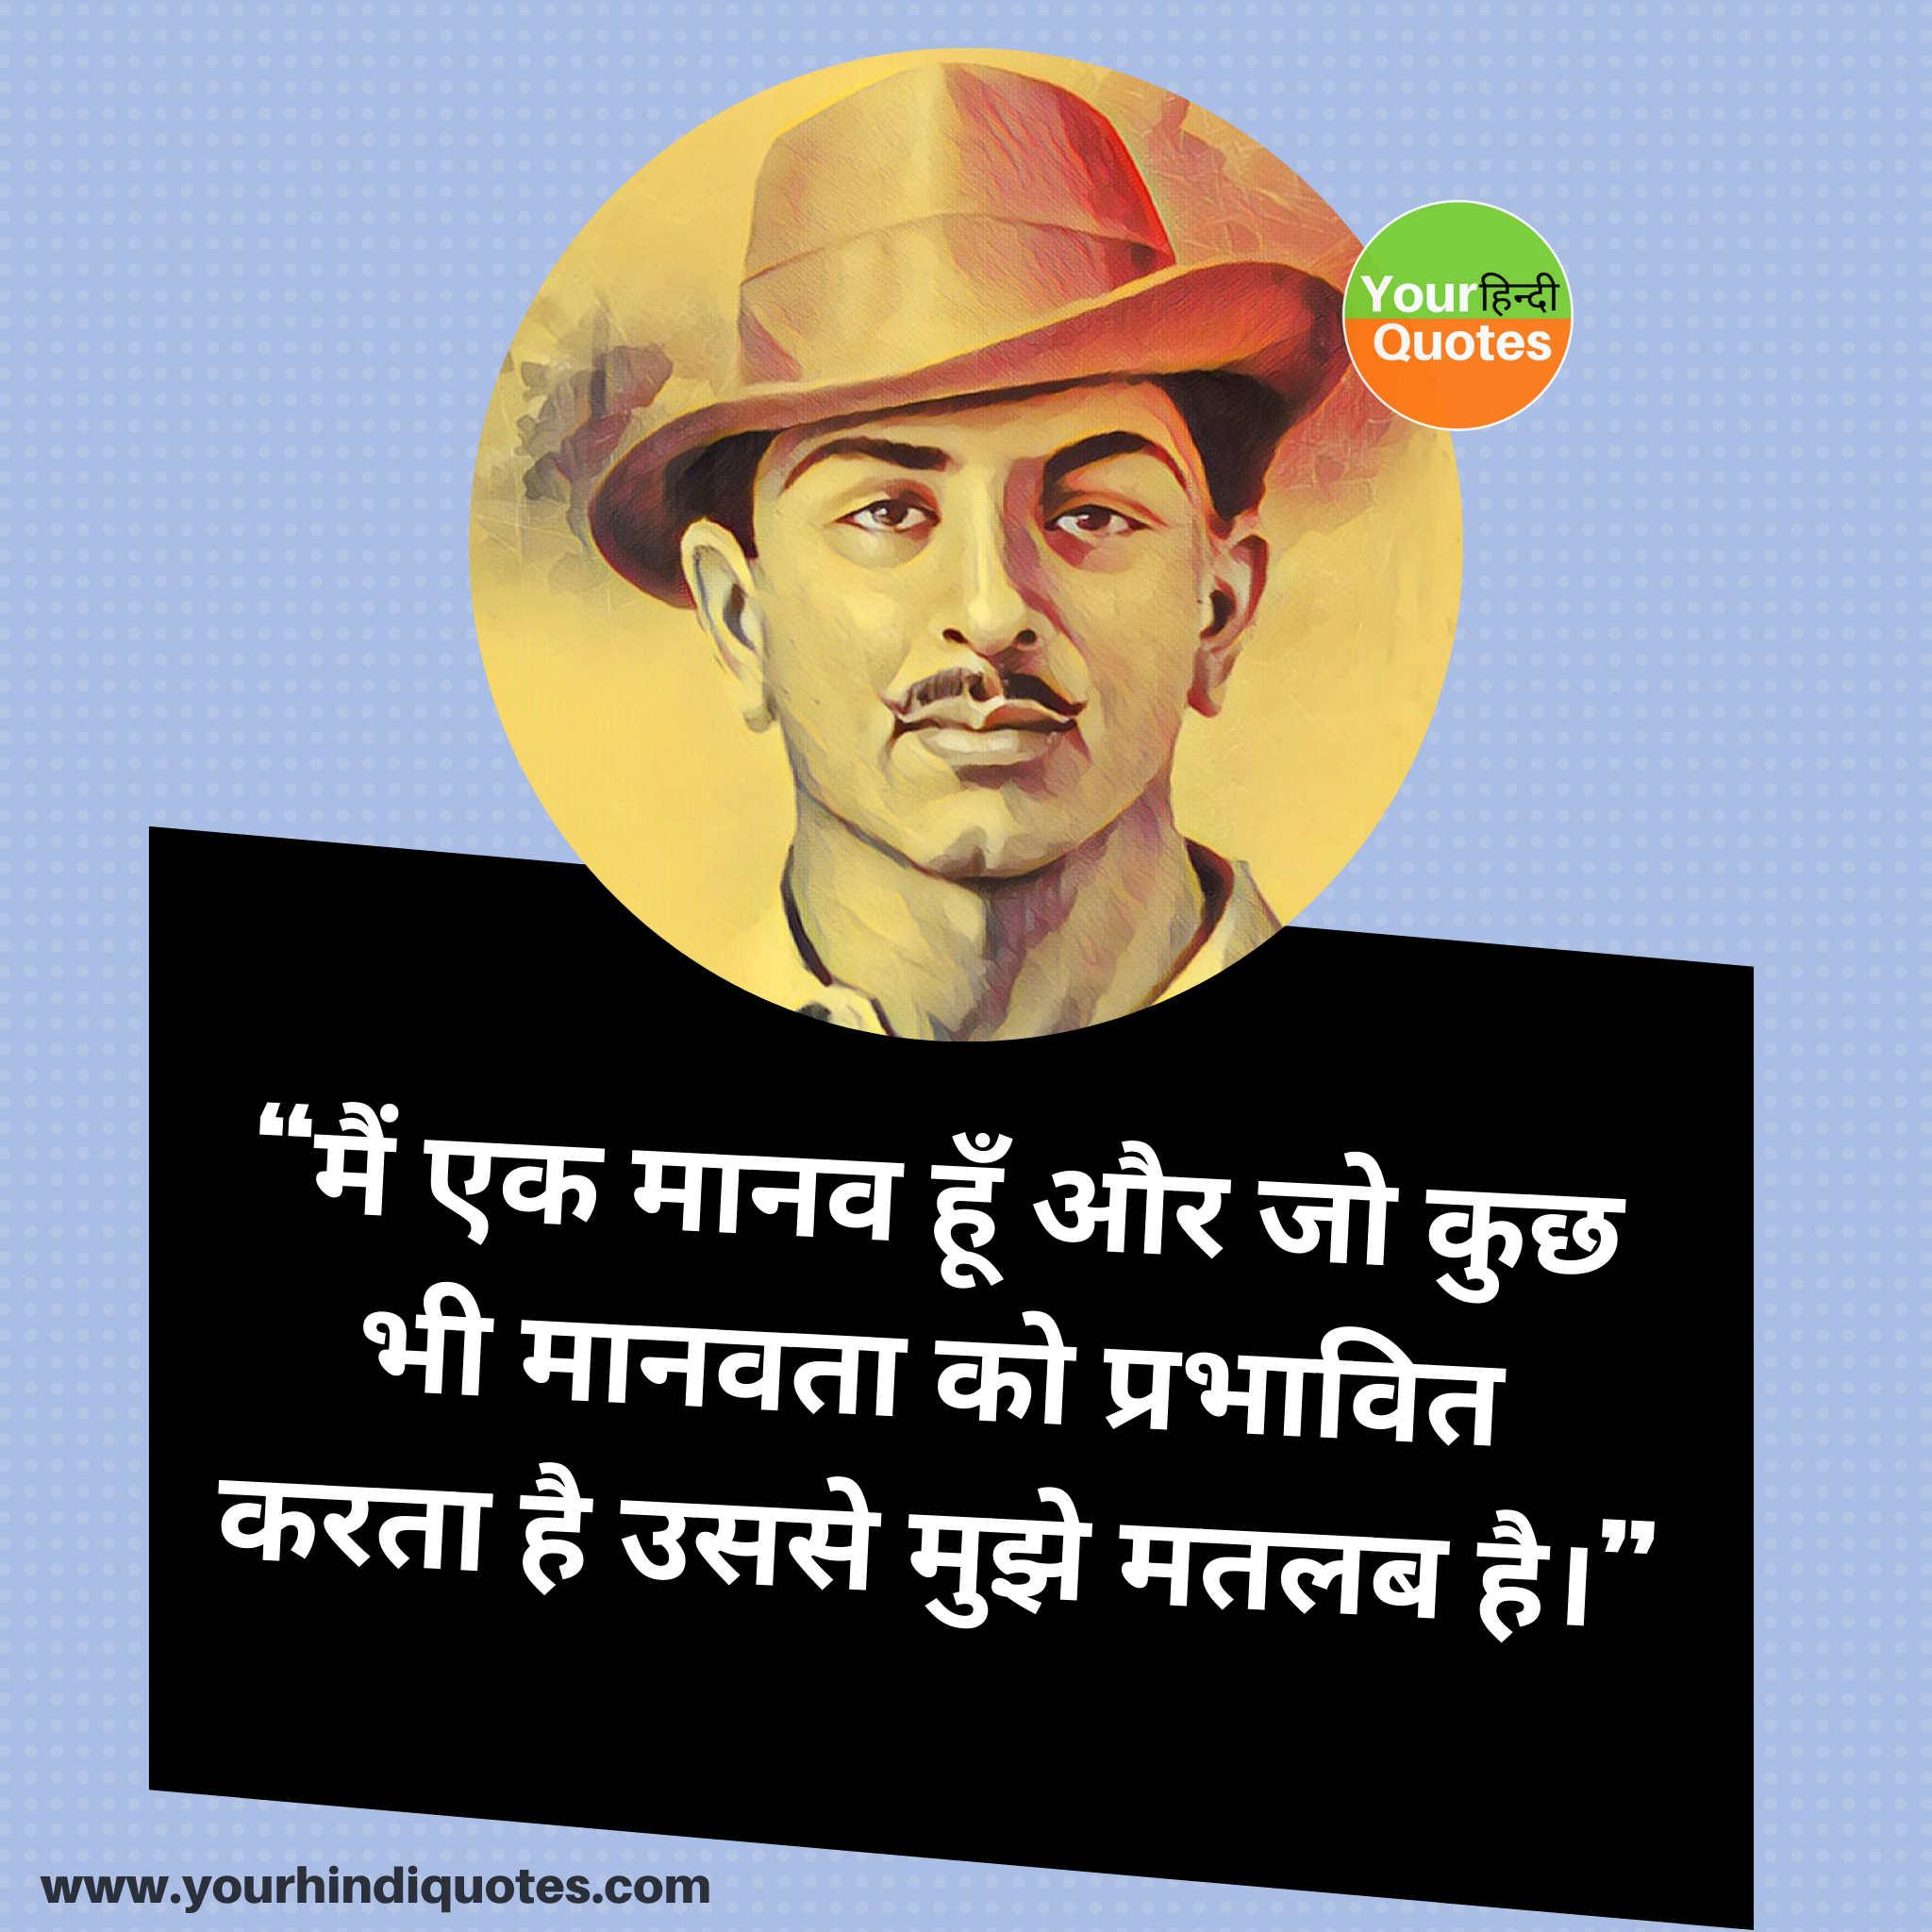 Bhagat Singh Hindi Quotes Wallpapers